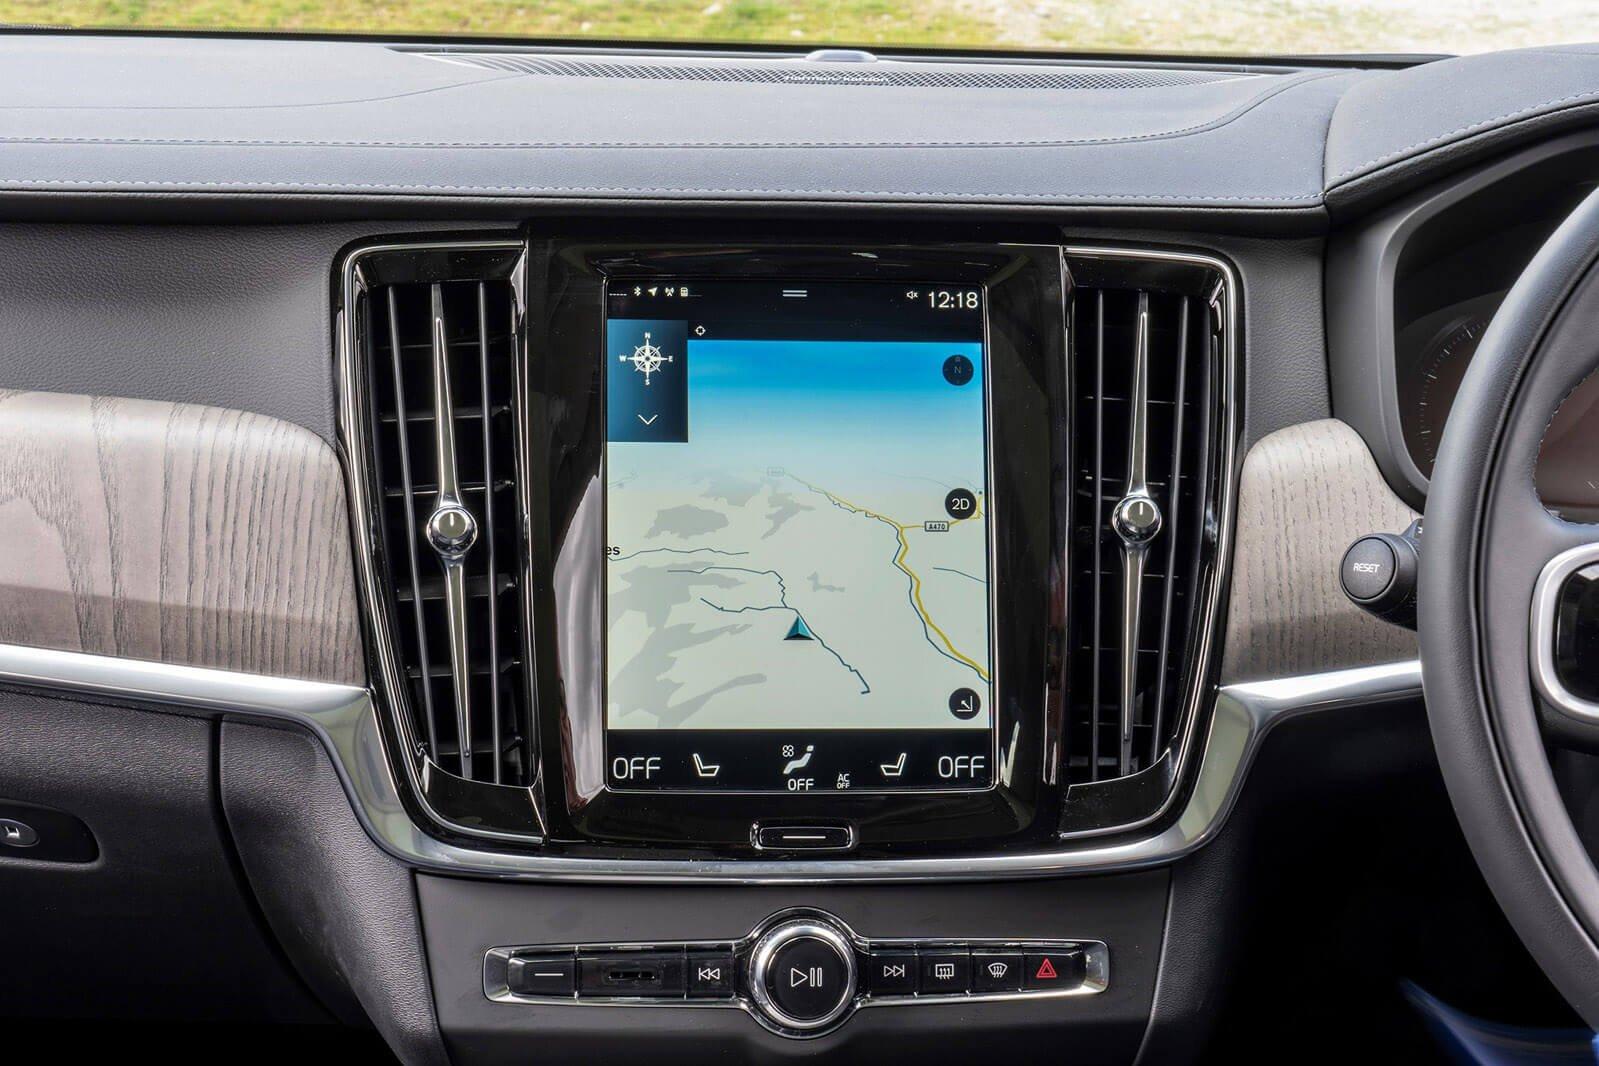 Volvo V90 Cross Country 2021 Infotainment screen